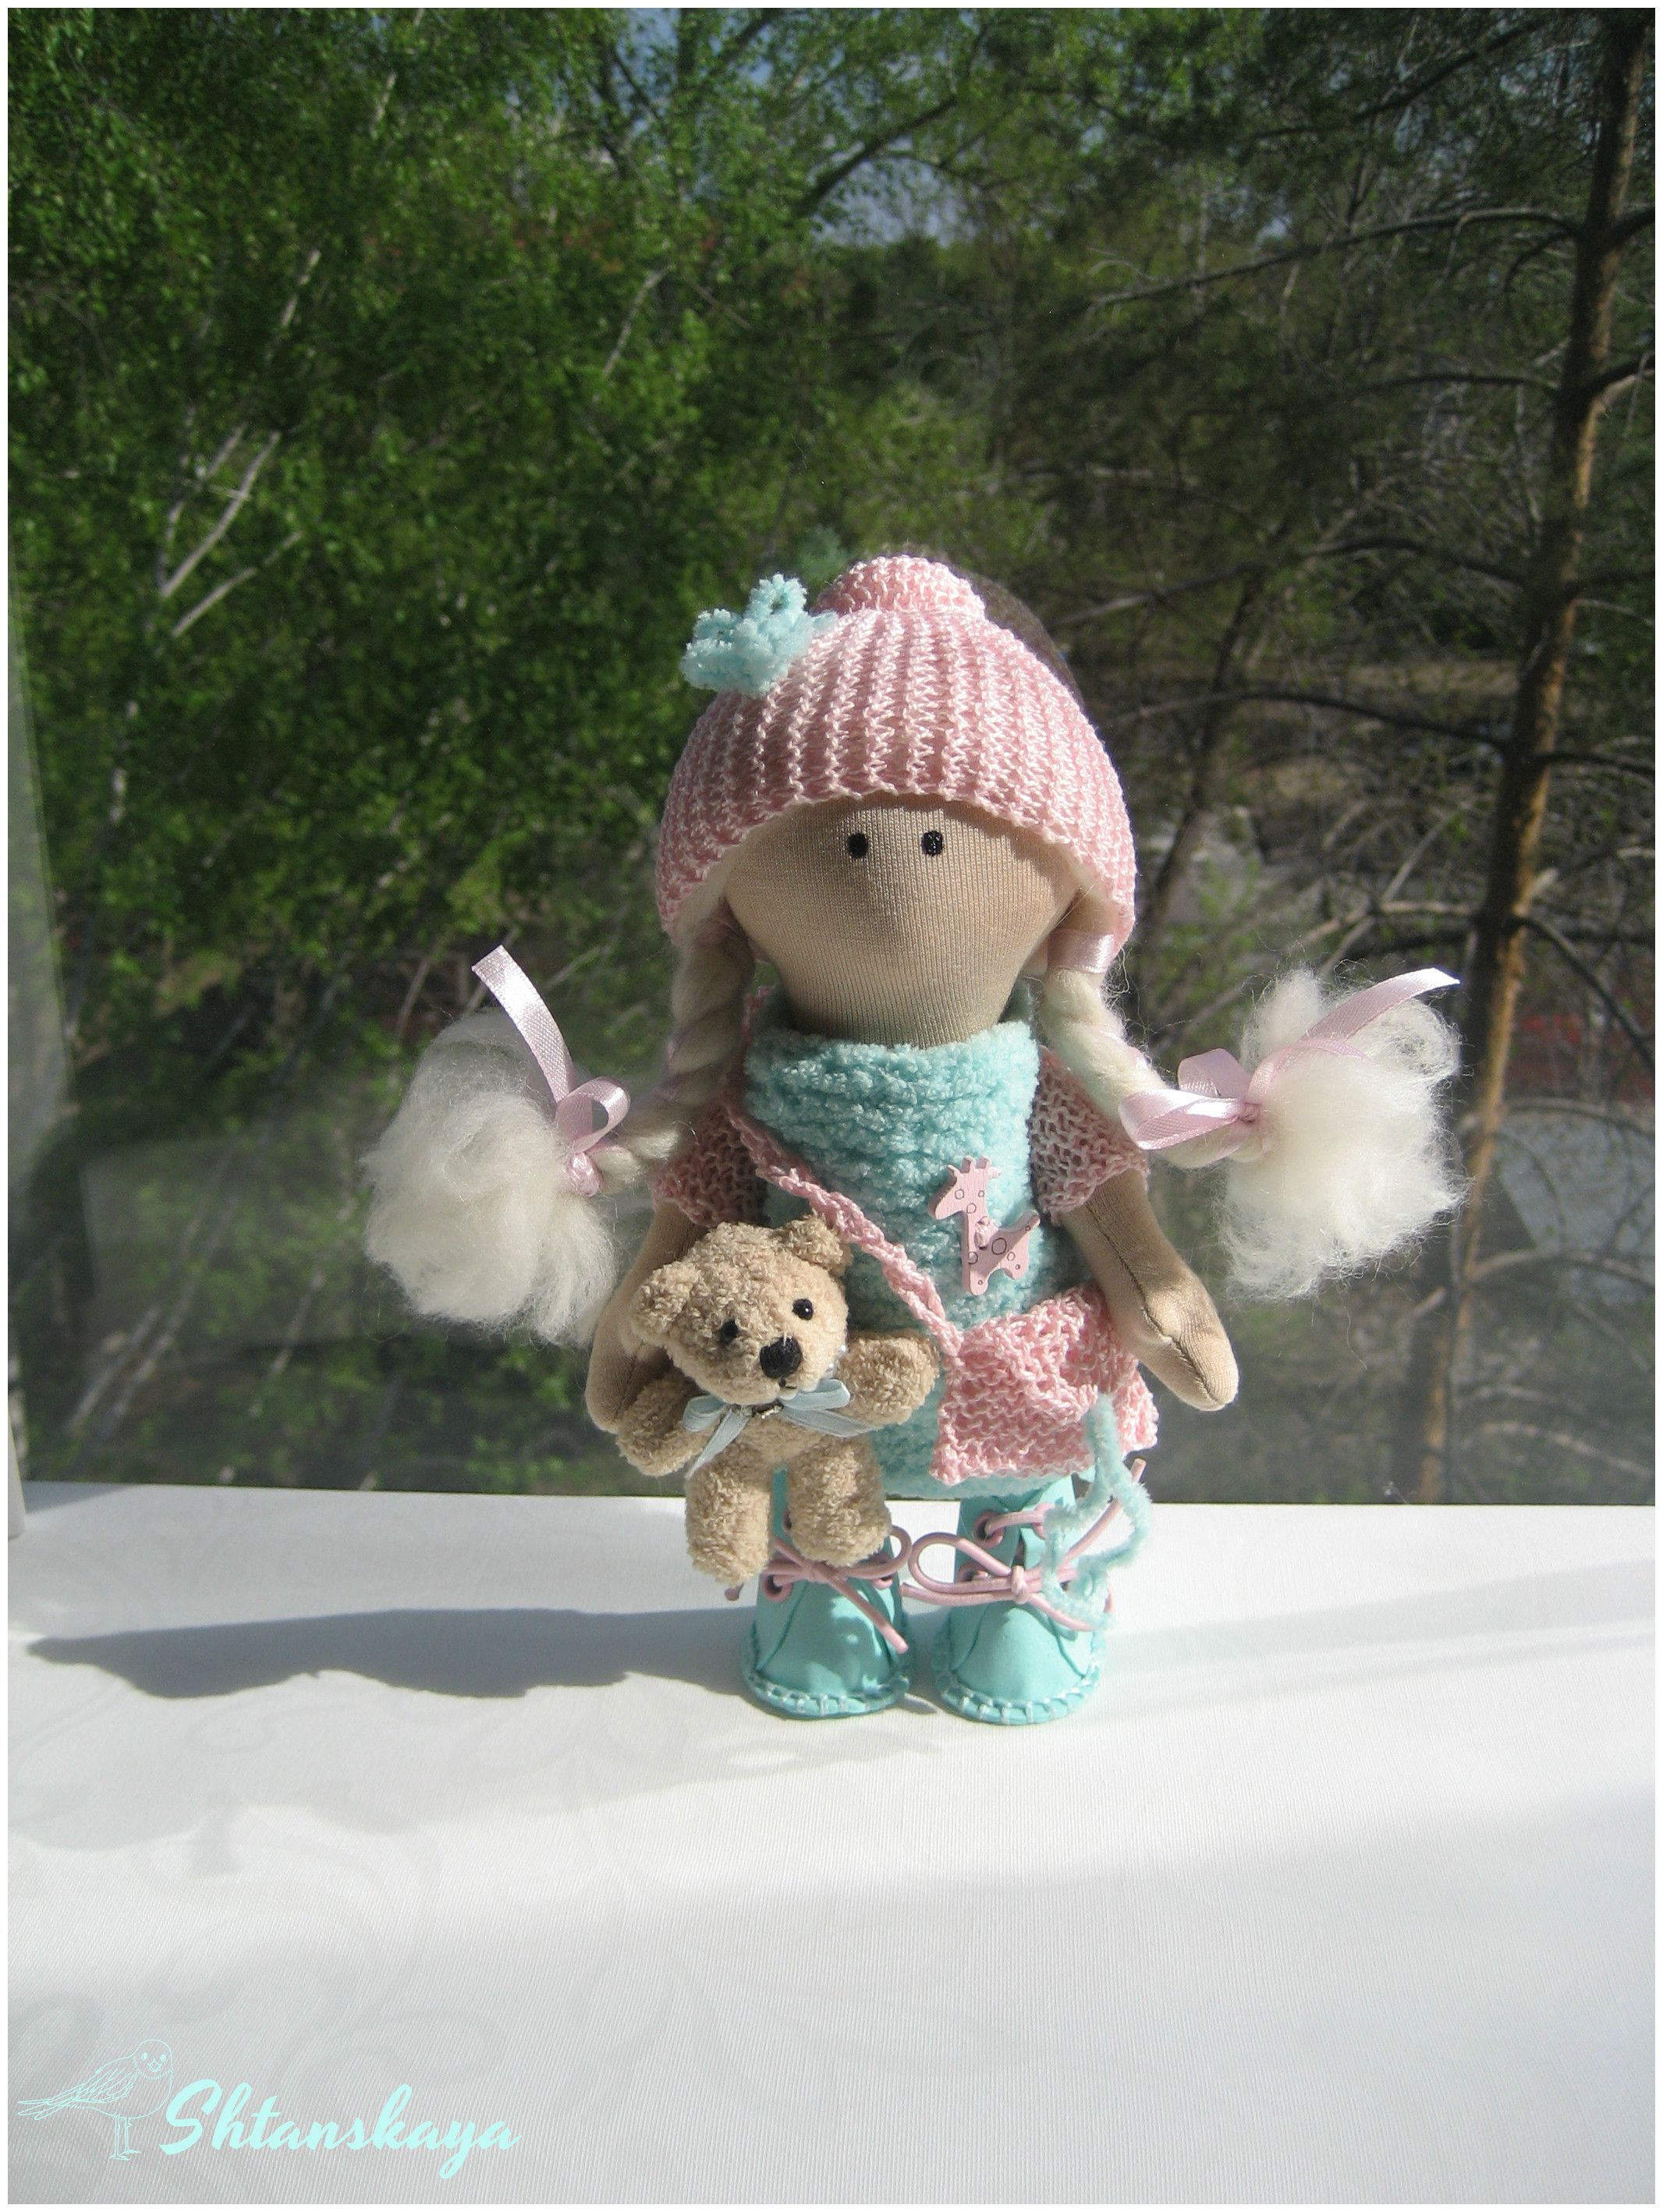 dolls кукла подарки handmade сувенир ручнаяработа интерьернаякукла дети